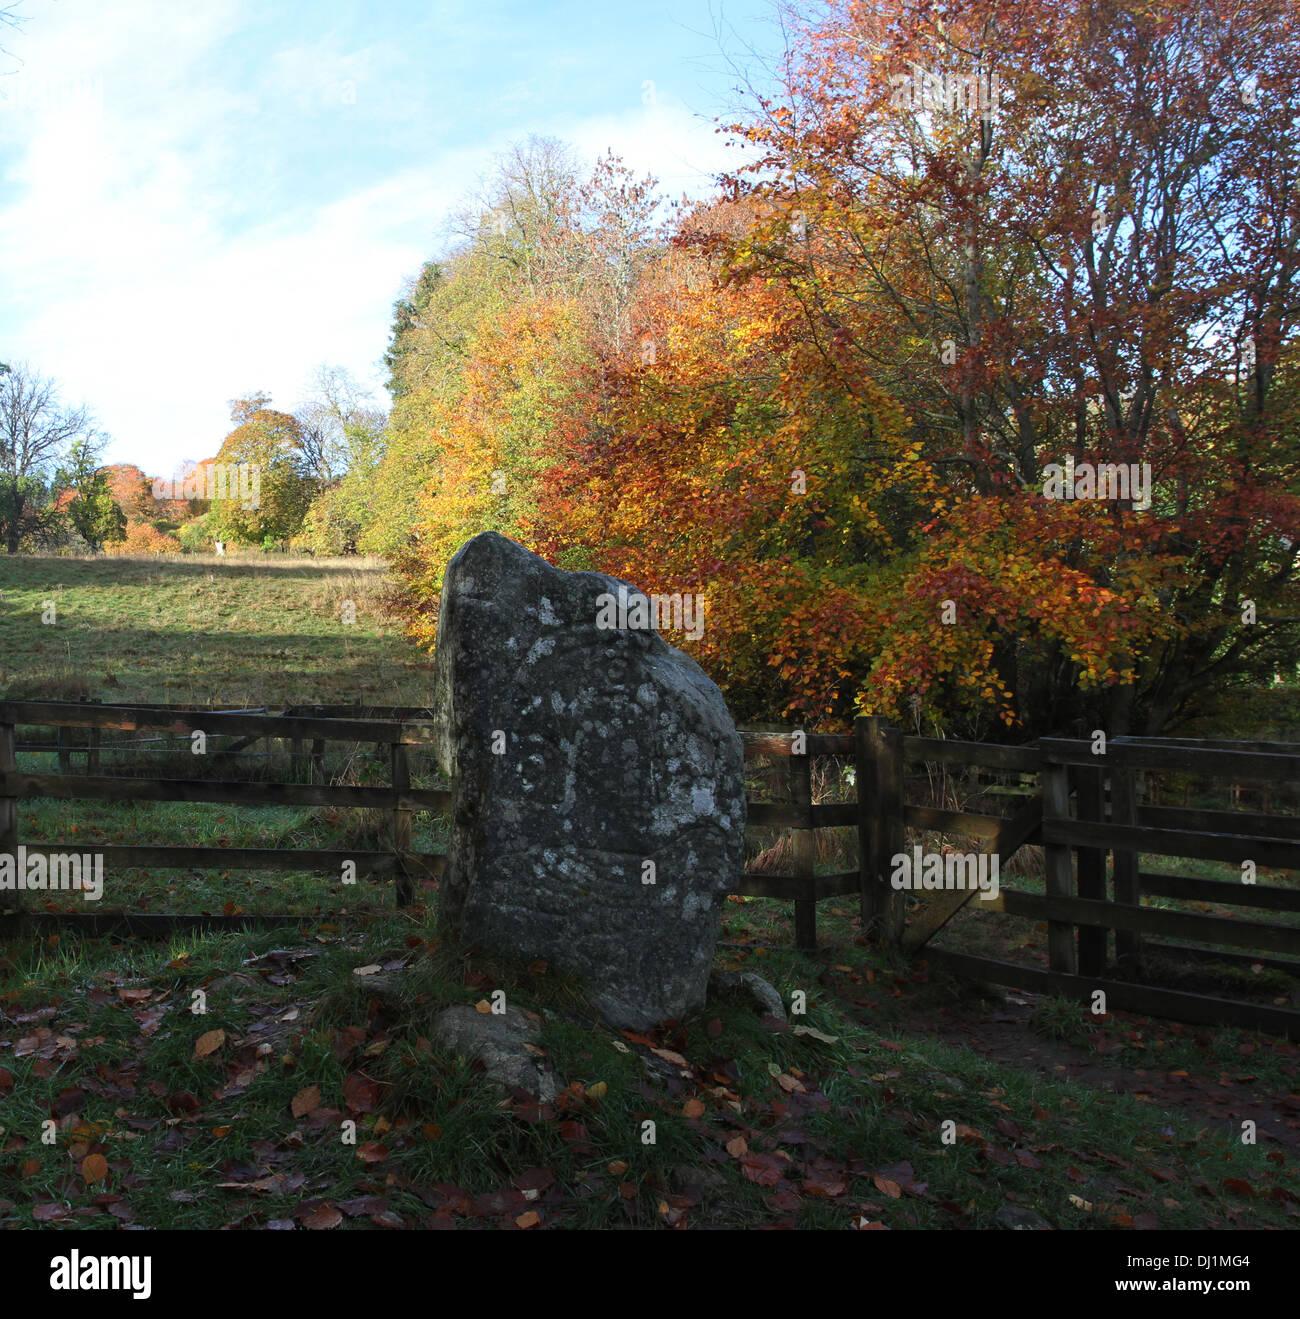 The Eagle Stone Strathpeffer Scotland  November 2013 Stock Photo